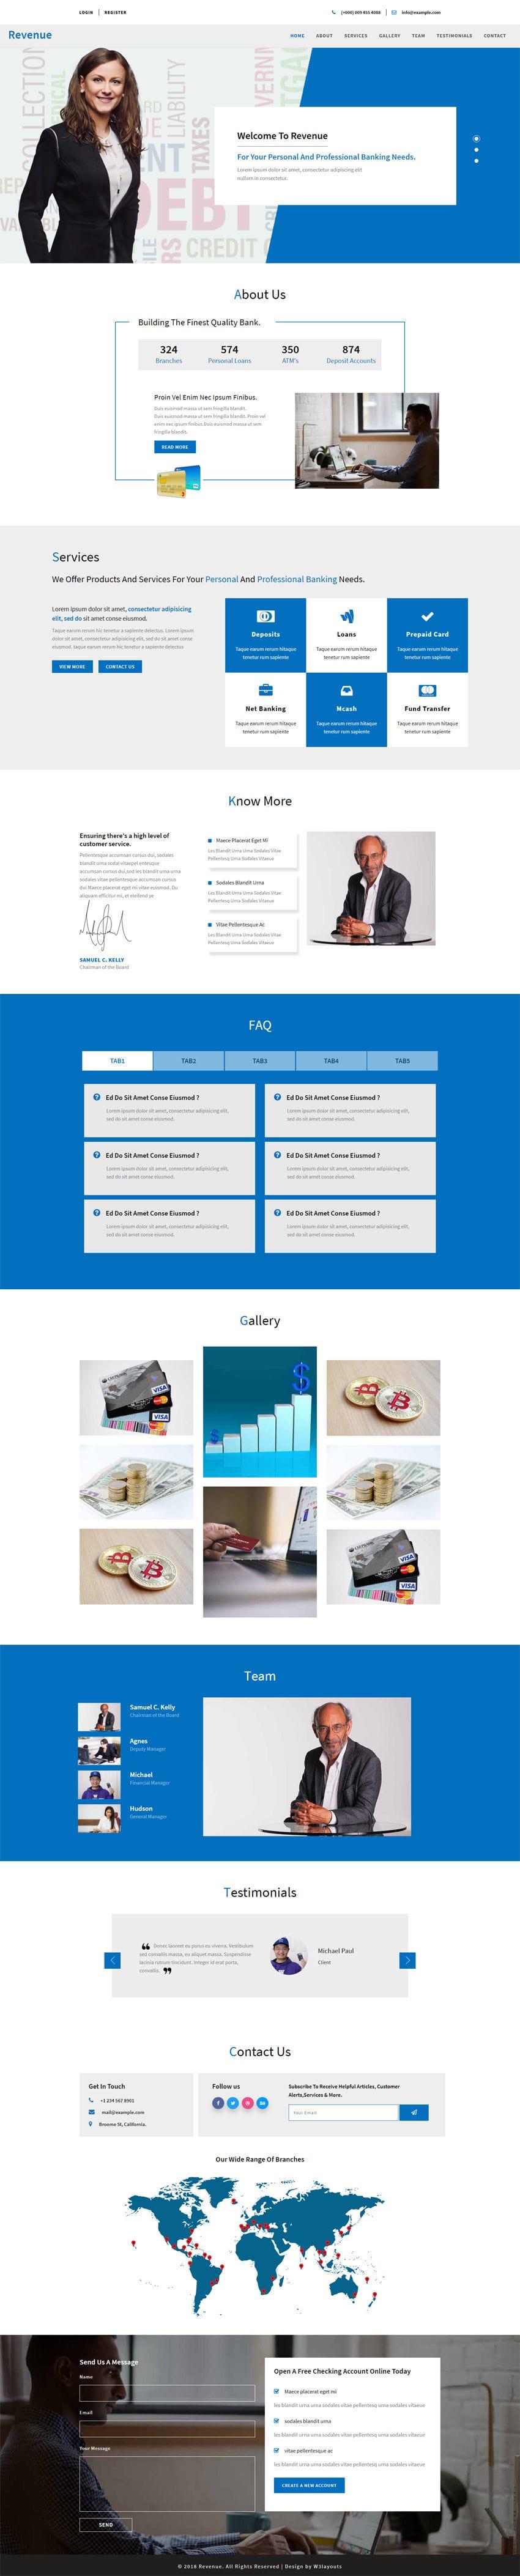 revenue banking category bootstrap responsive web template. Black Bedroom Furniture Sets. Home Design Ideas